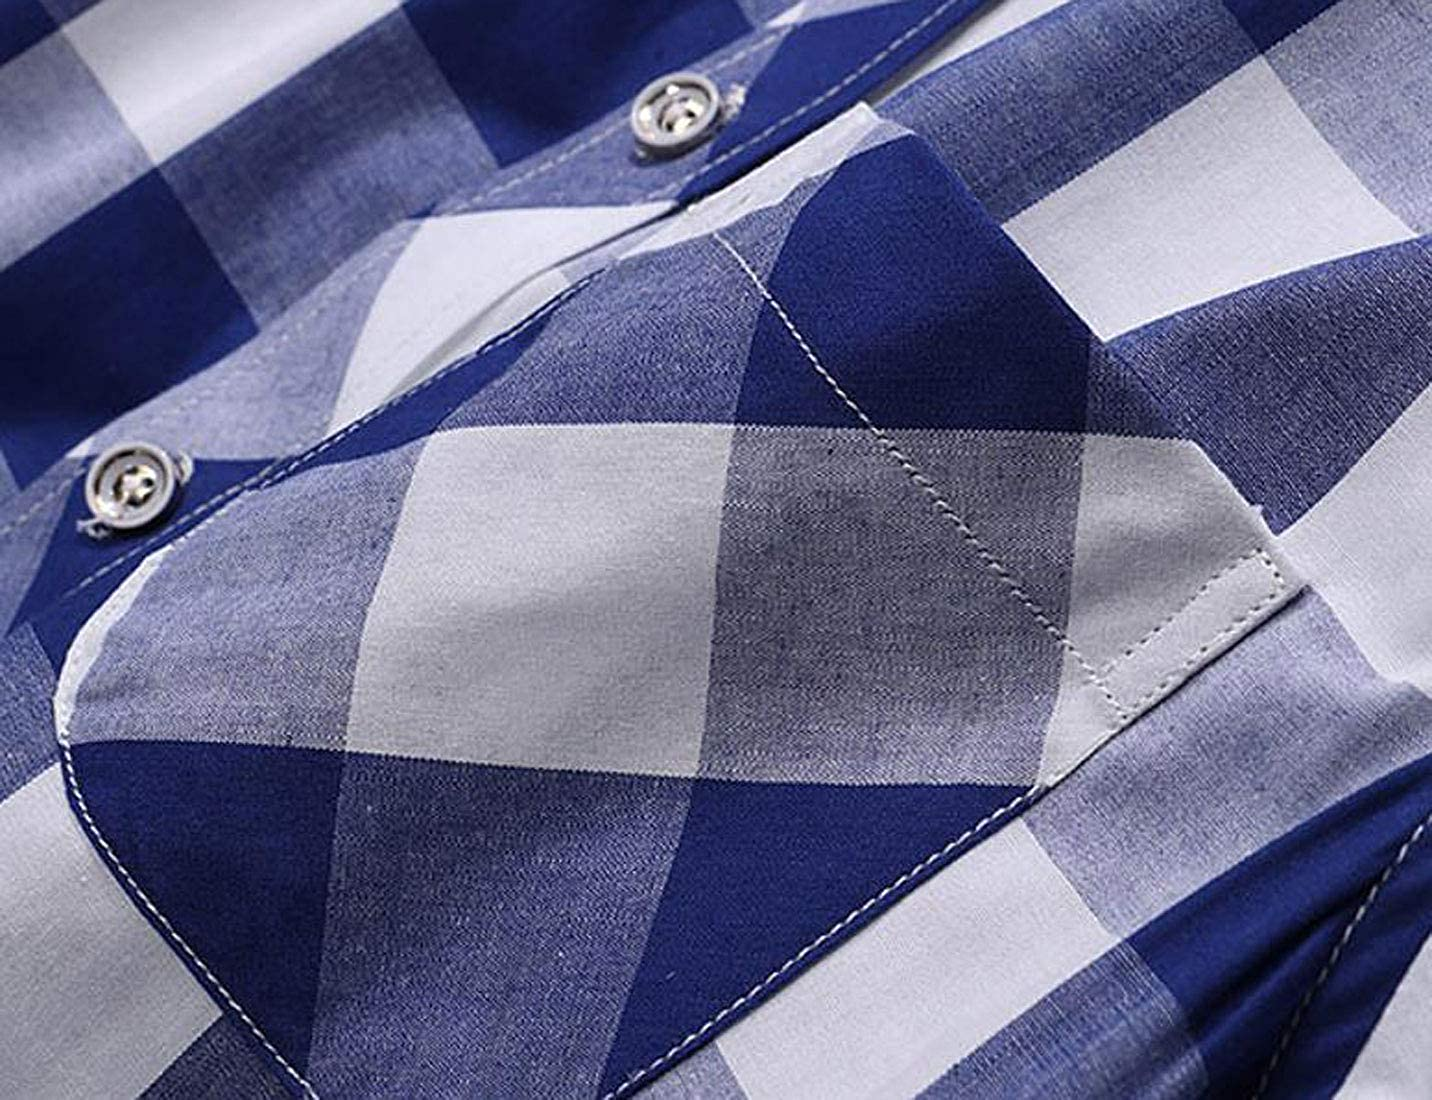 XTX Mens Classic Version Casual Plaid Short Sleeve Summer Shirt Linen Cotton